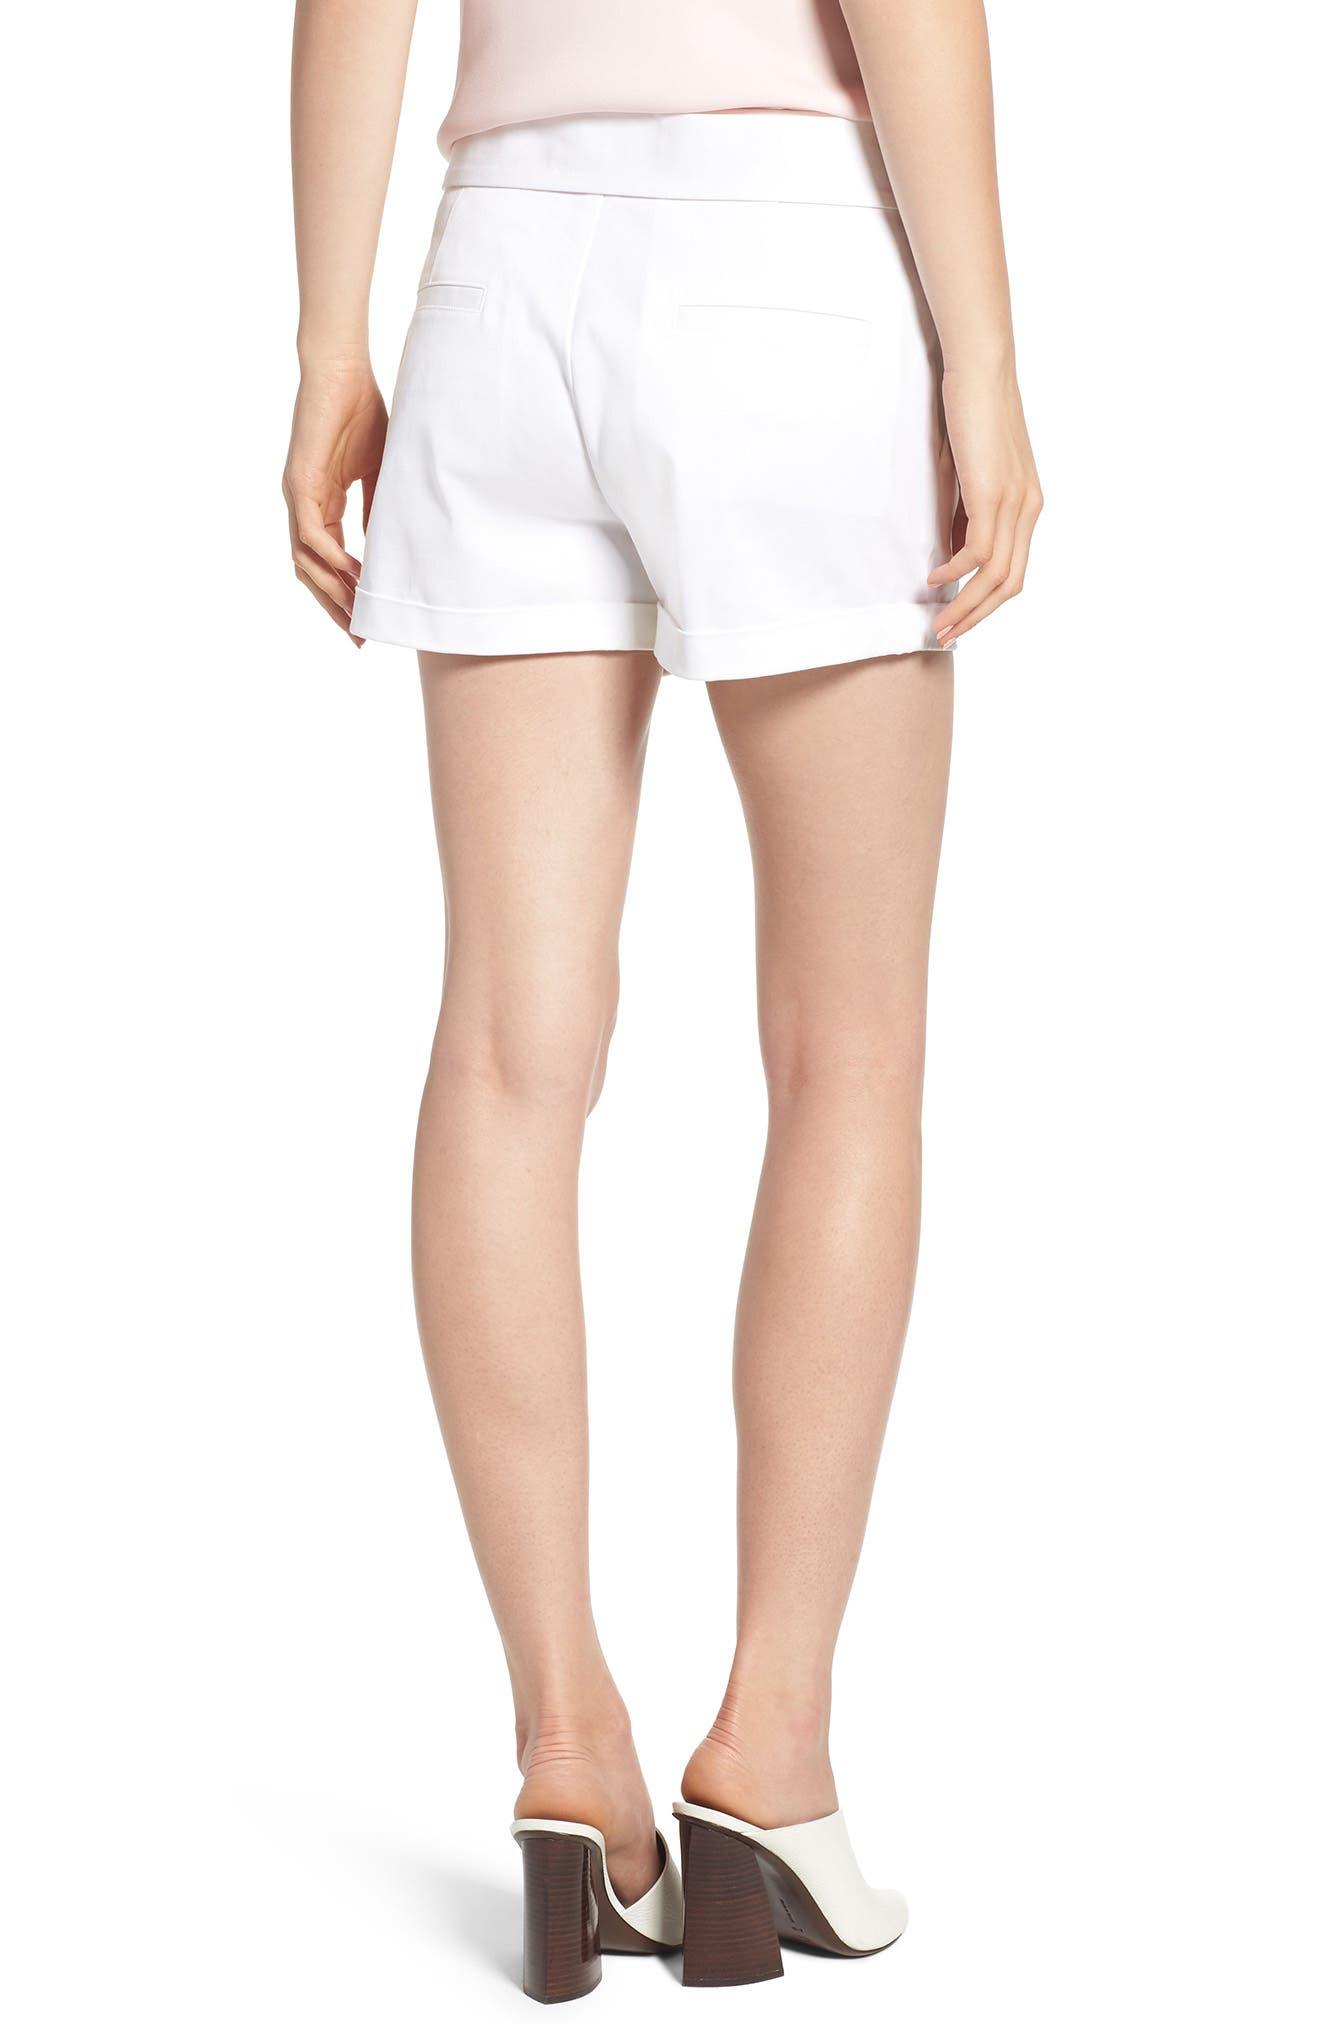 Yelinda Shorts,                             Alternate thumbnail 2, color,                             100